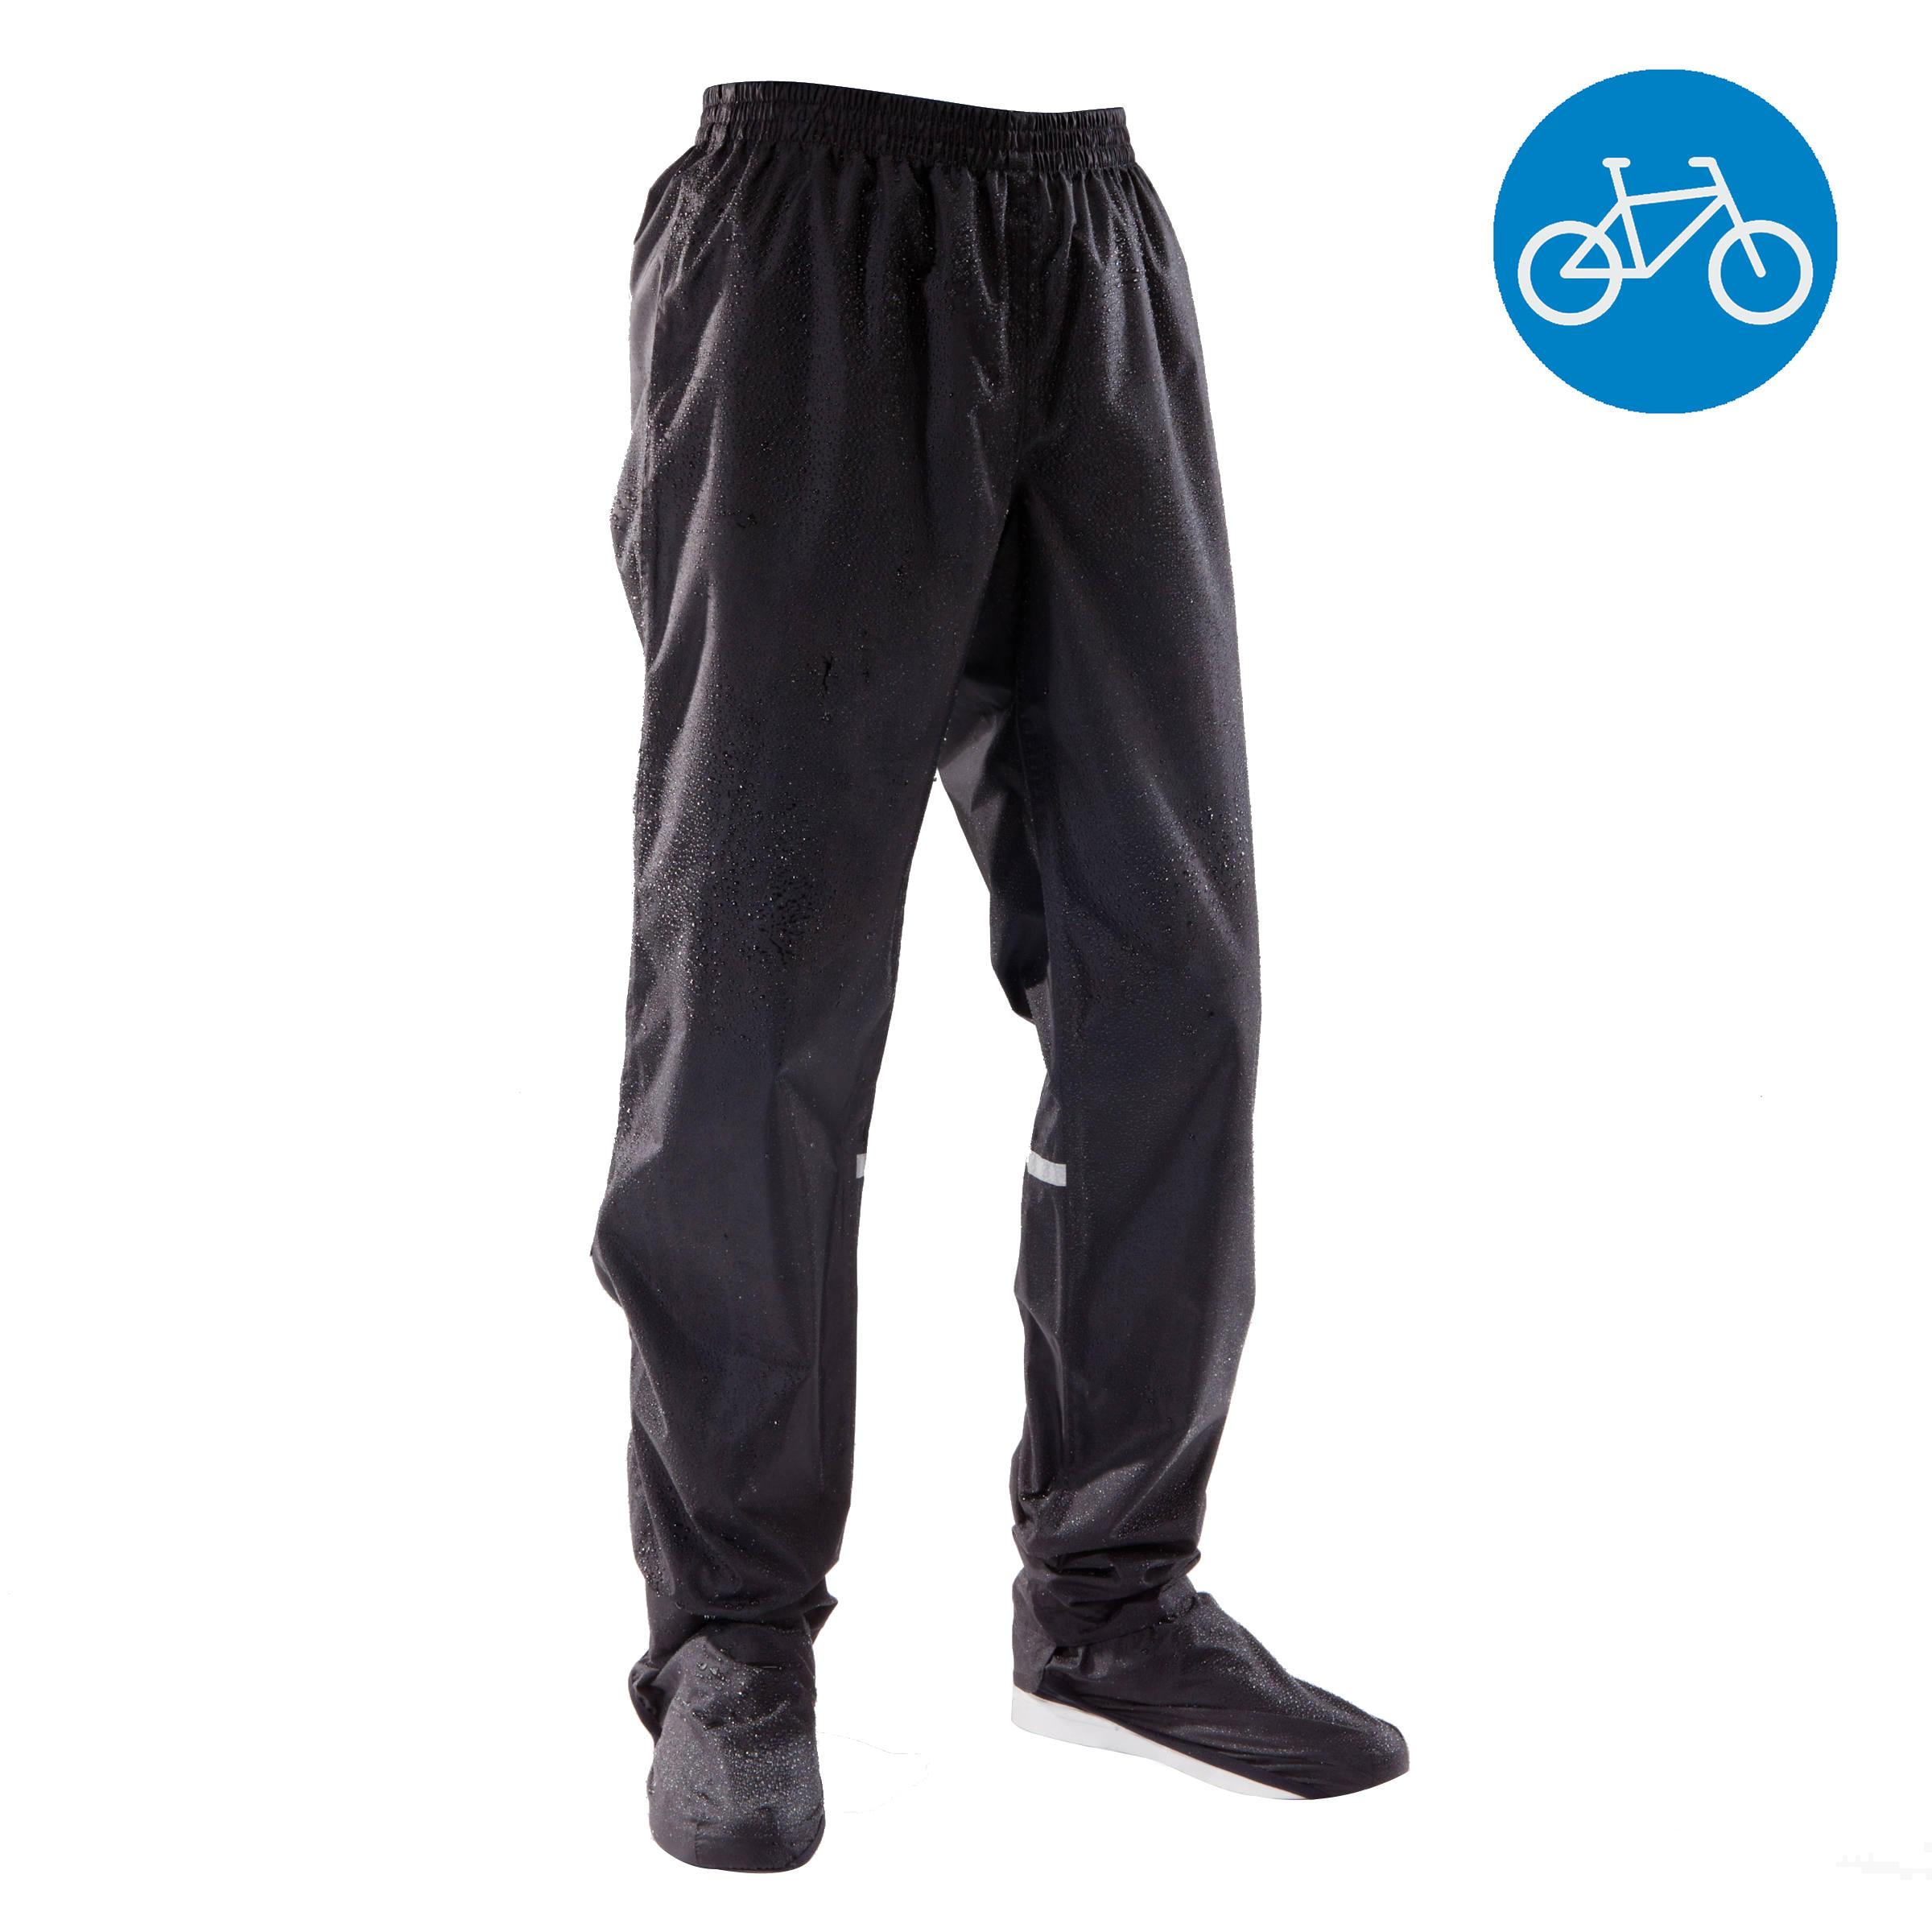 Pantalones Impermeables Para Hombre Decathlon